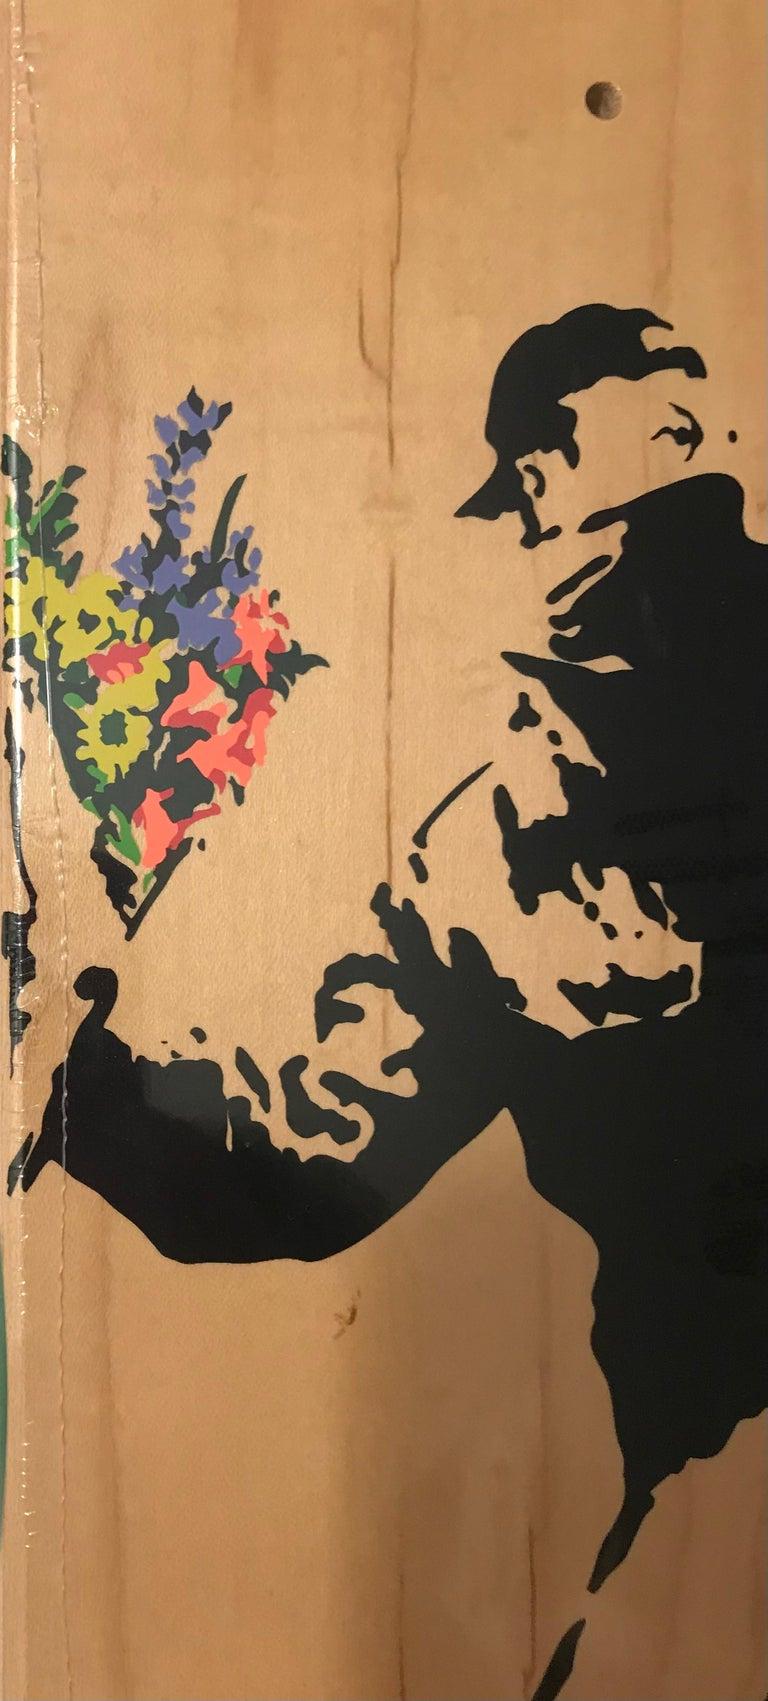 Banksy Flower Thrower Skate Deck Colored Edition, 2016 Brown Bethlehem Pop Art   - Sculpture by Banksy